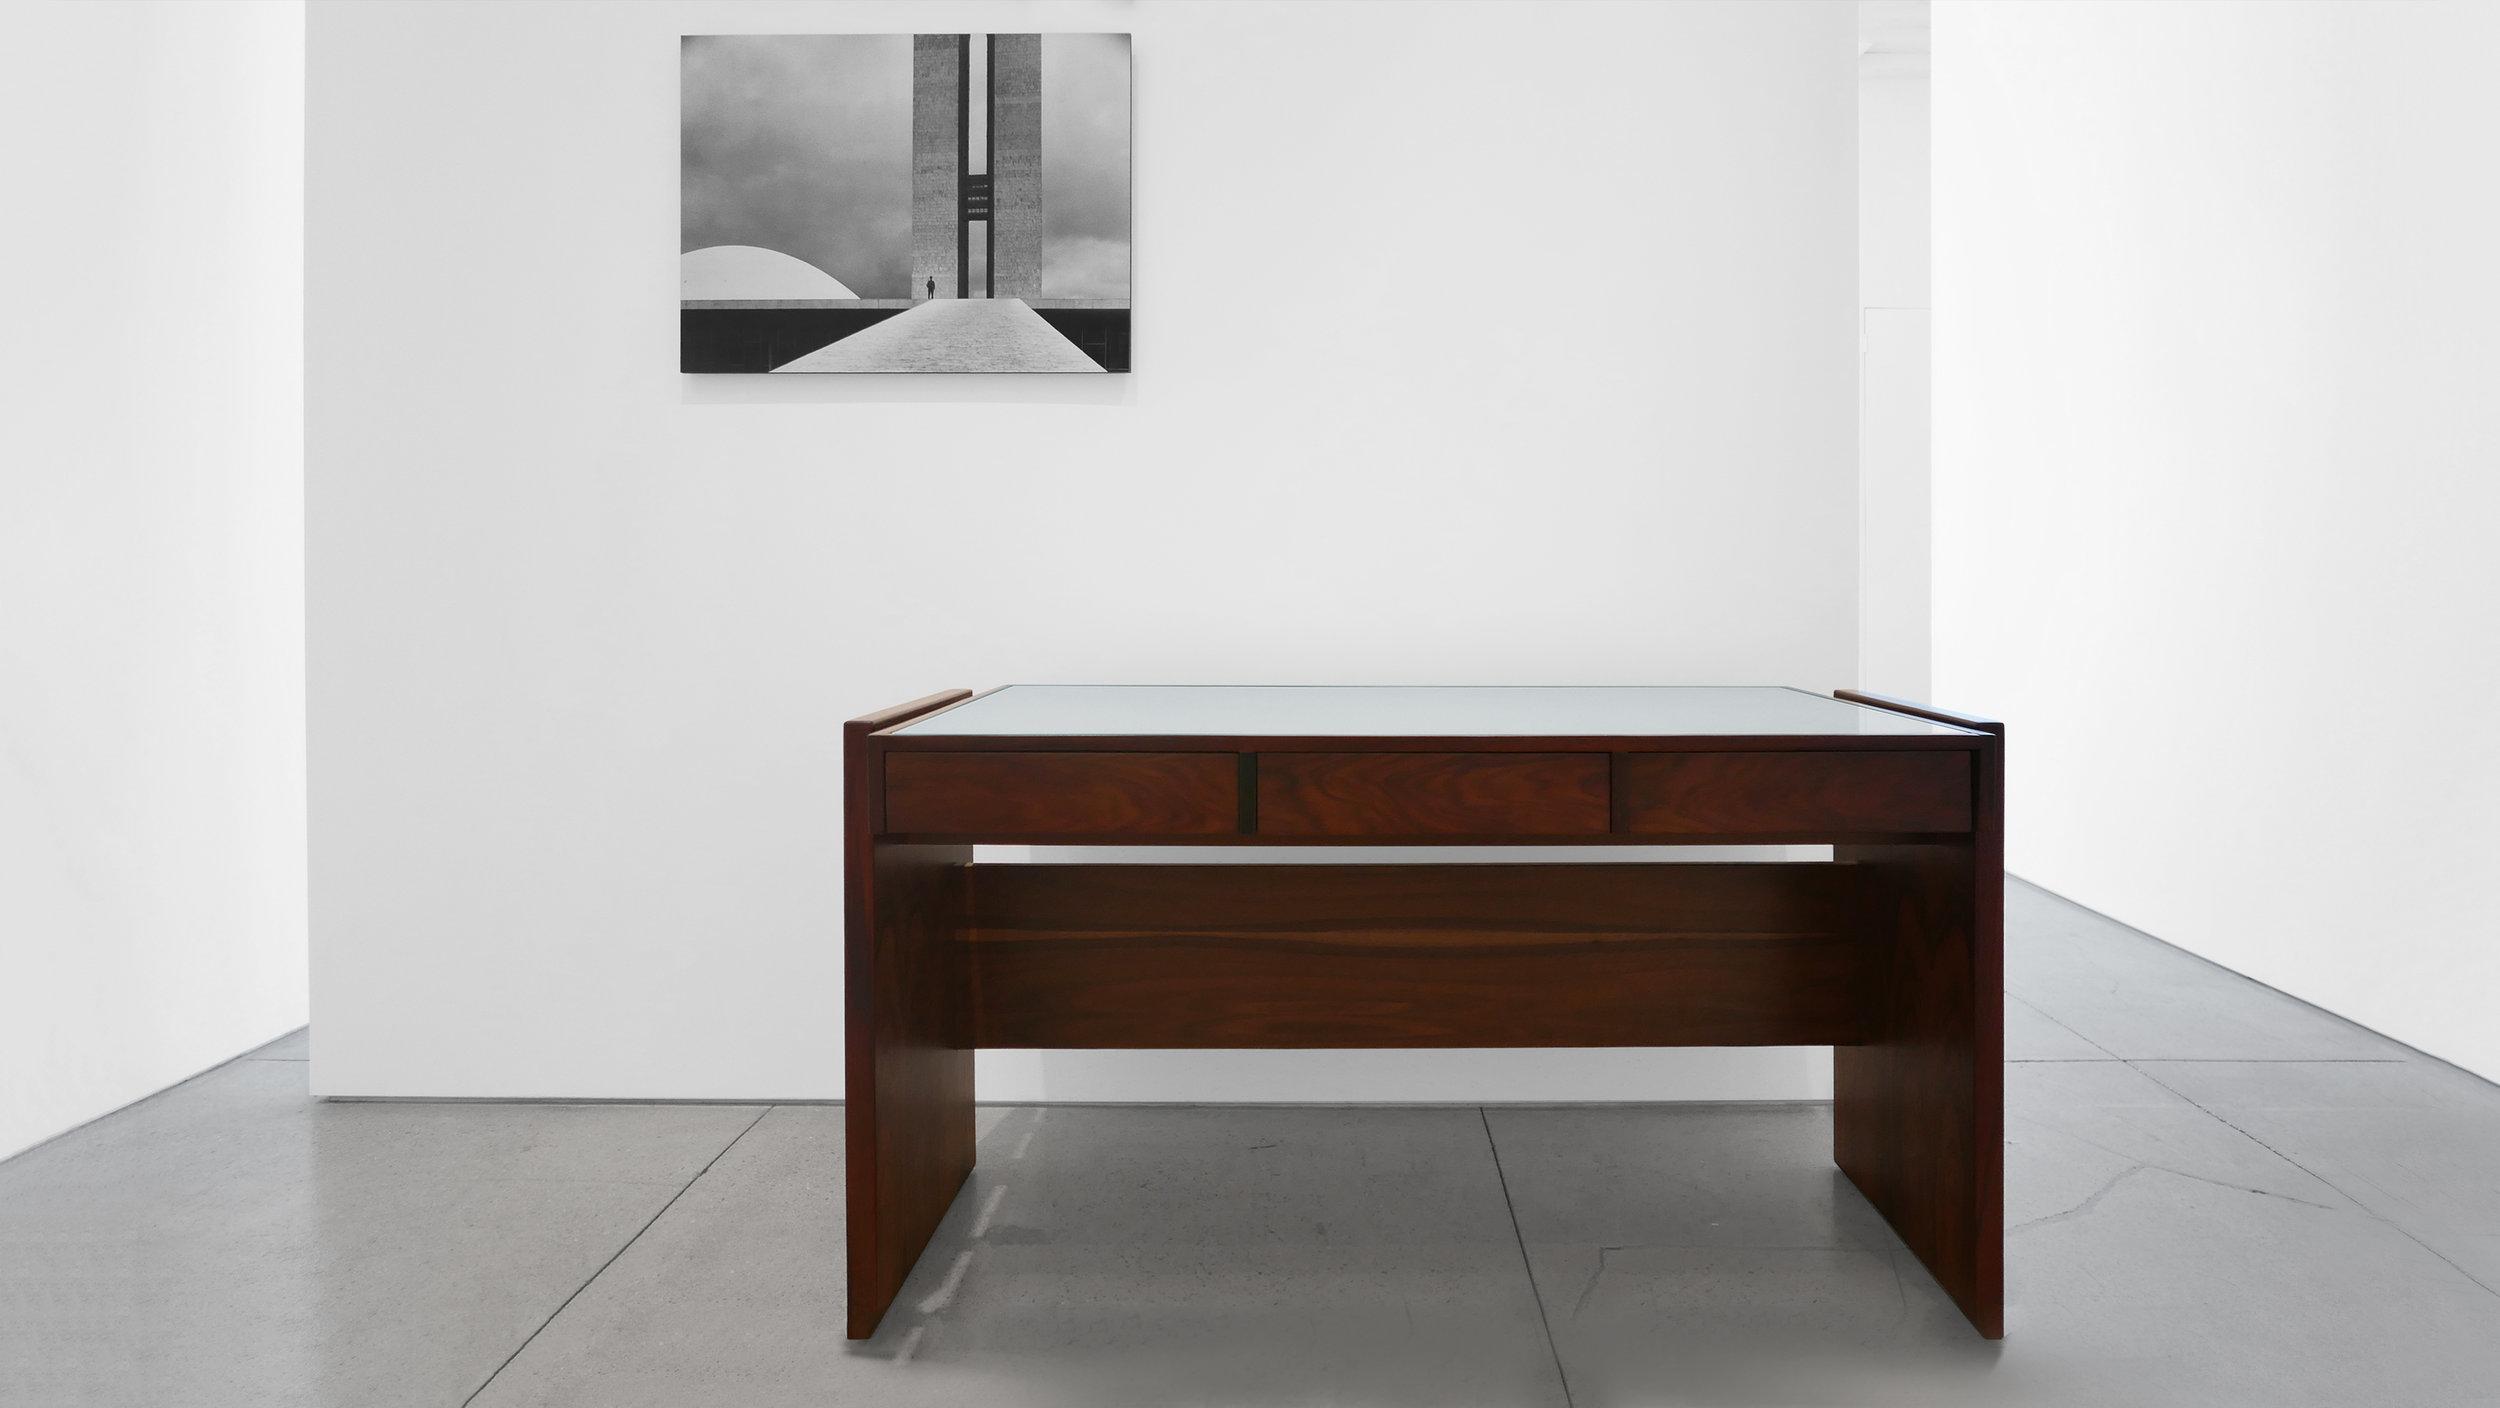 Design Brasileiro, Curated by Ulysses de Santi, Peter Blake Gallery, 2018, Installation View_9.jpg